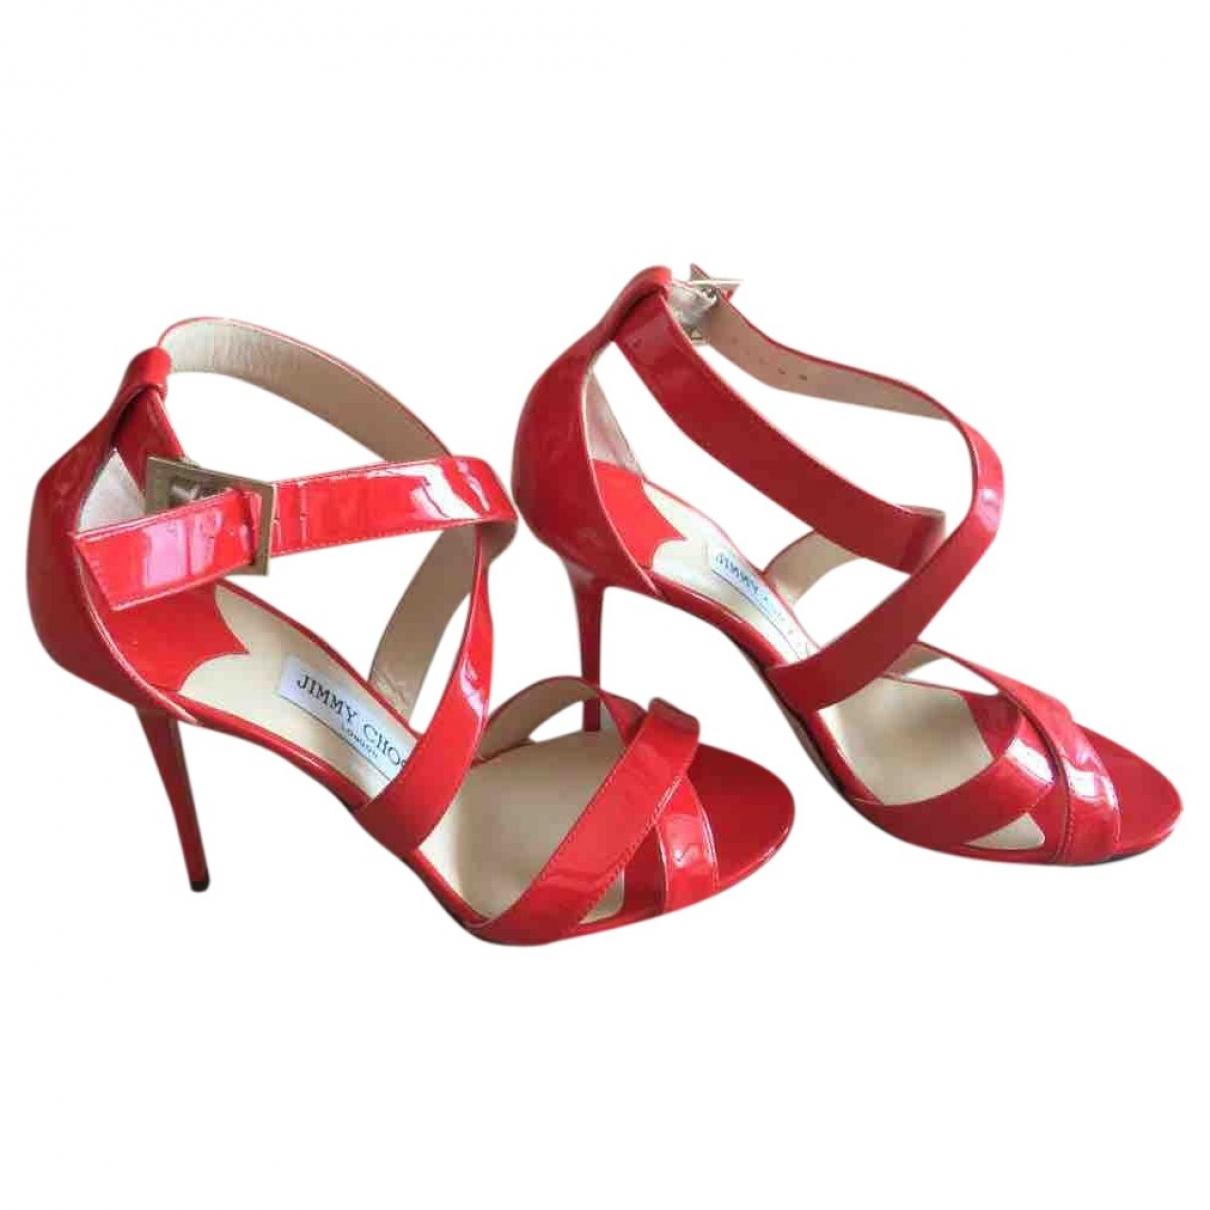 Jimmy Choo \N Patent leather Sandals for Women 38.5 EU